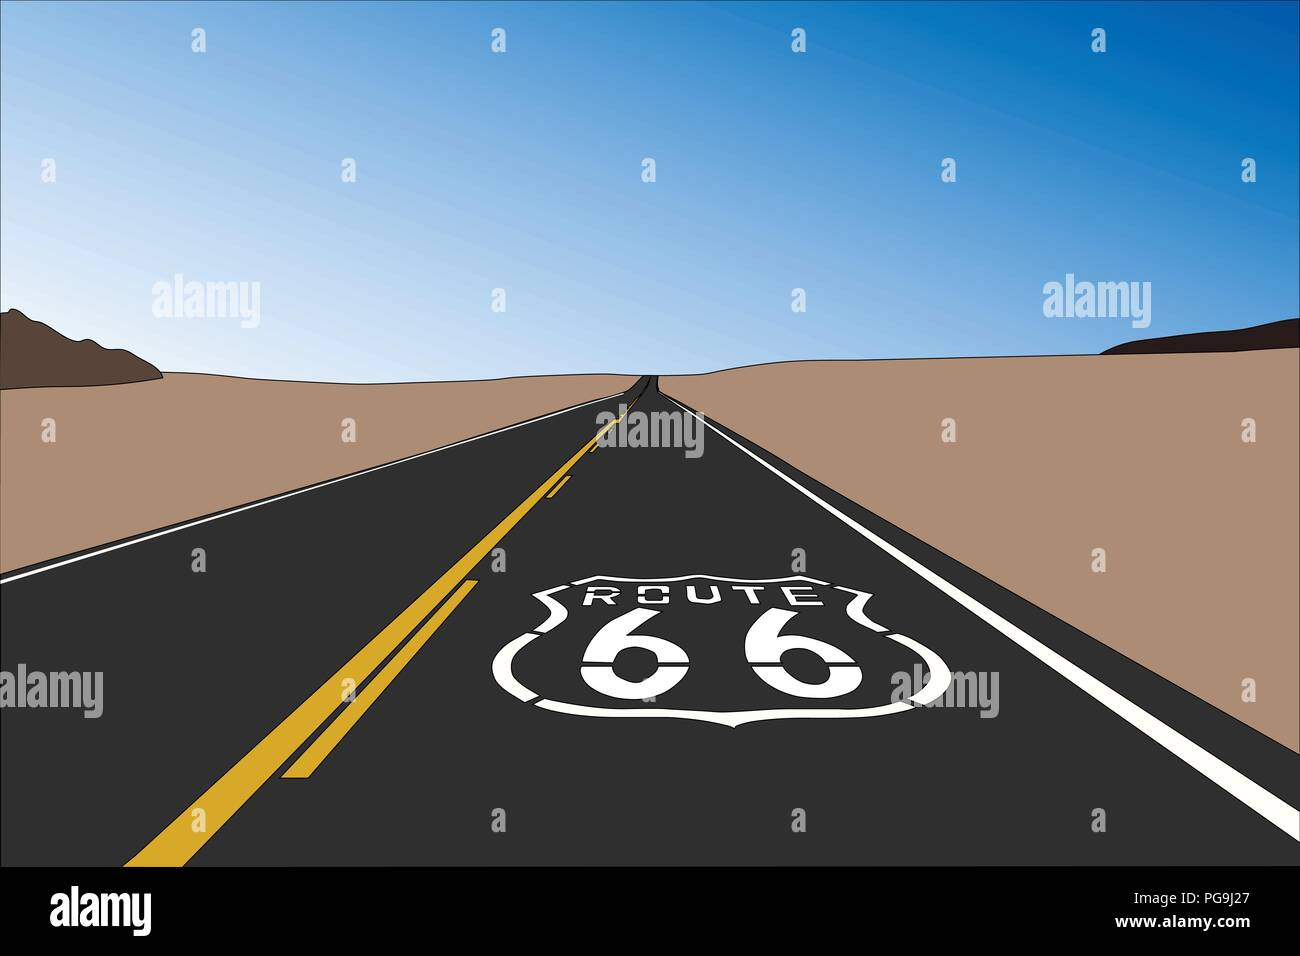 Route 66 pavement sign in the vast California Mojave desert.  Vector illustration. Stock Vector